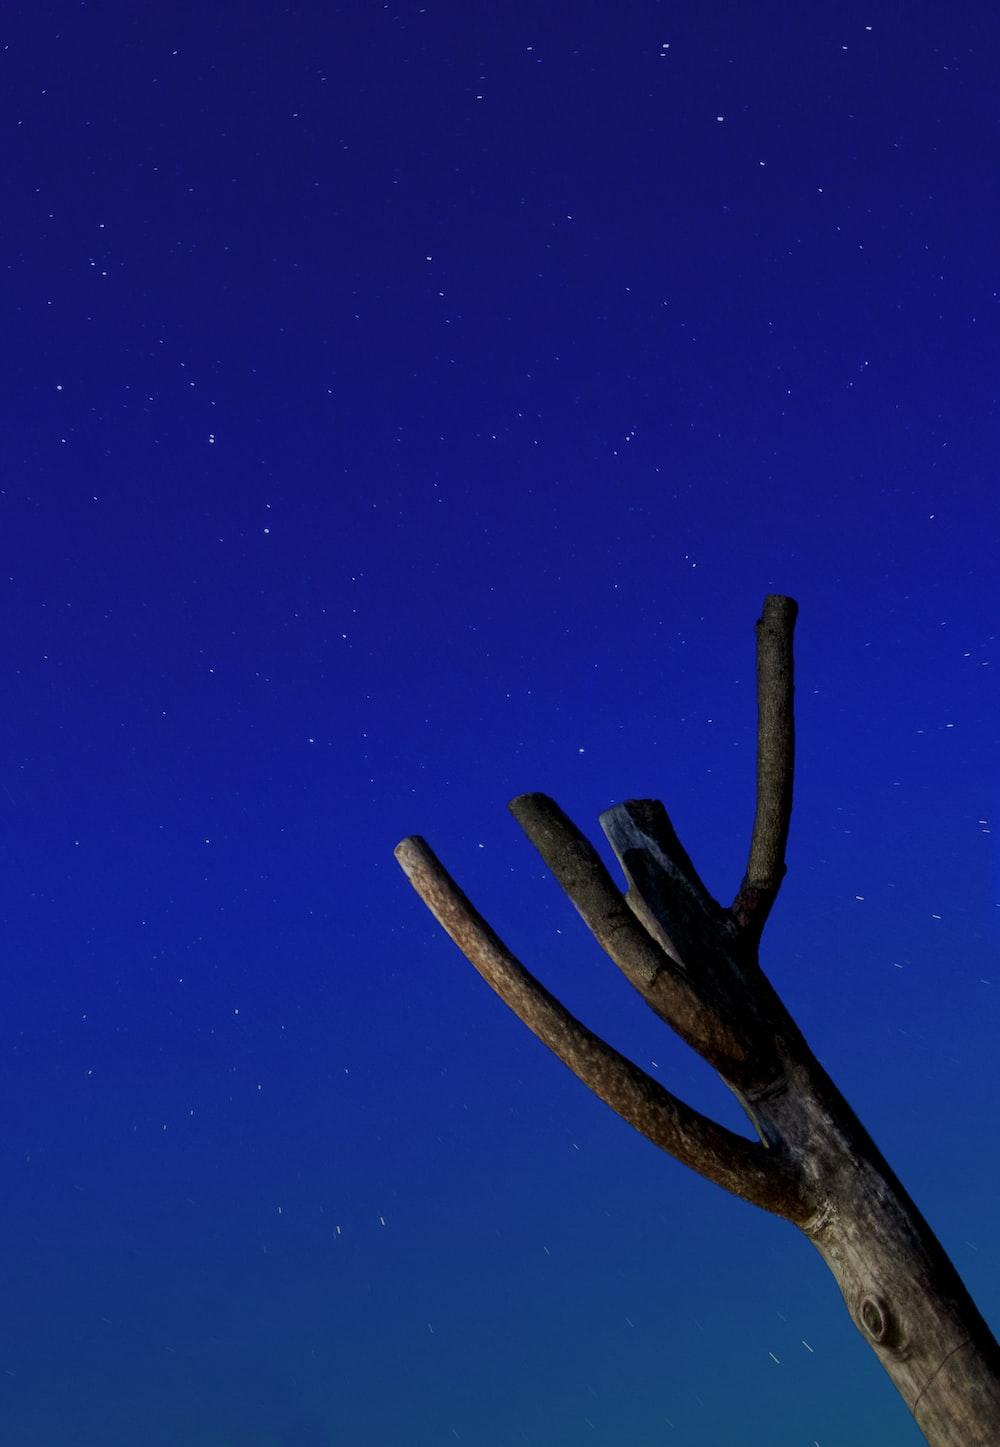 brown tree branch under blue sky